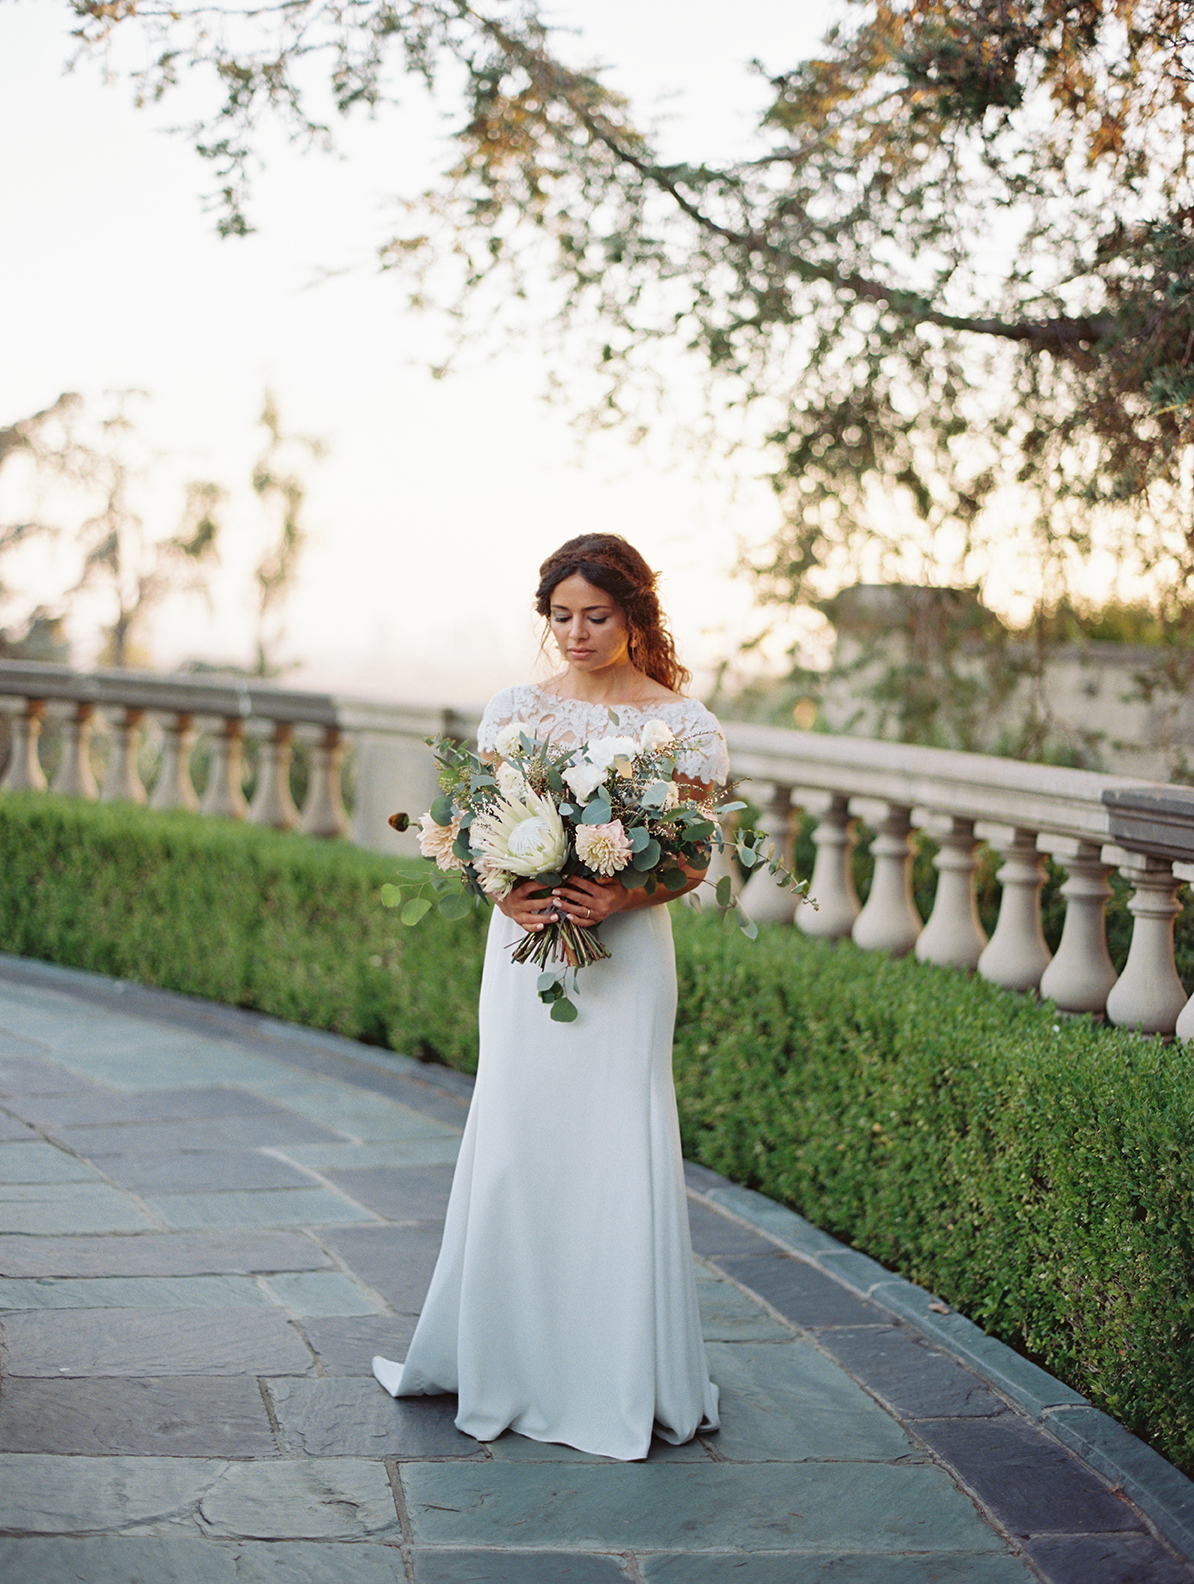 272-brian-sarra-los-angeles-wedding-brumley-wells-photography.jpg